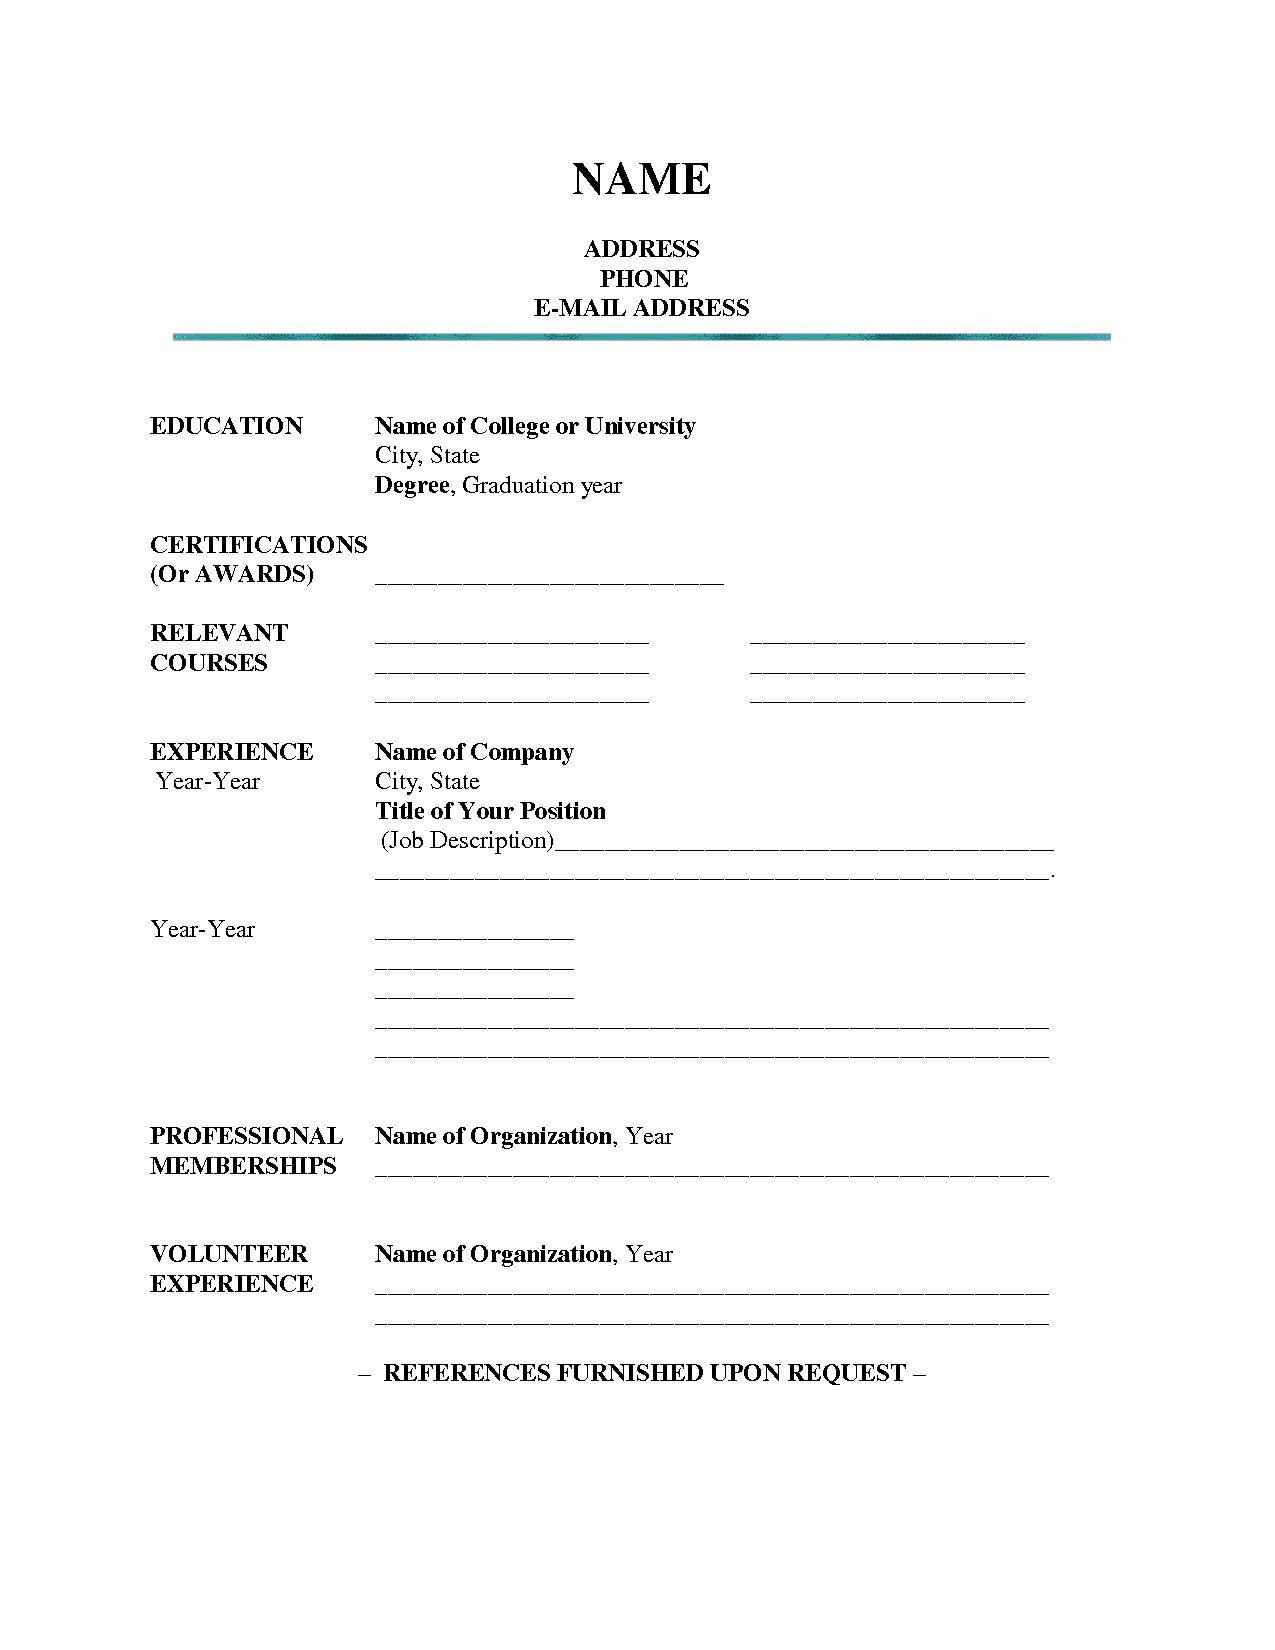 Blank Basic Resume Template Luxury Blank Resume Templates For Students Resume Builderresume In 2020 Job Resume Template Student Resume Template Resume Templates